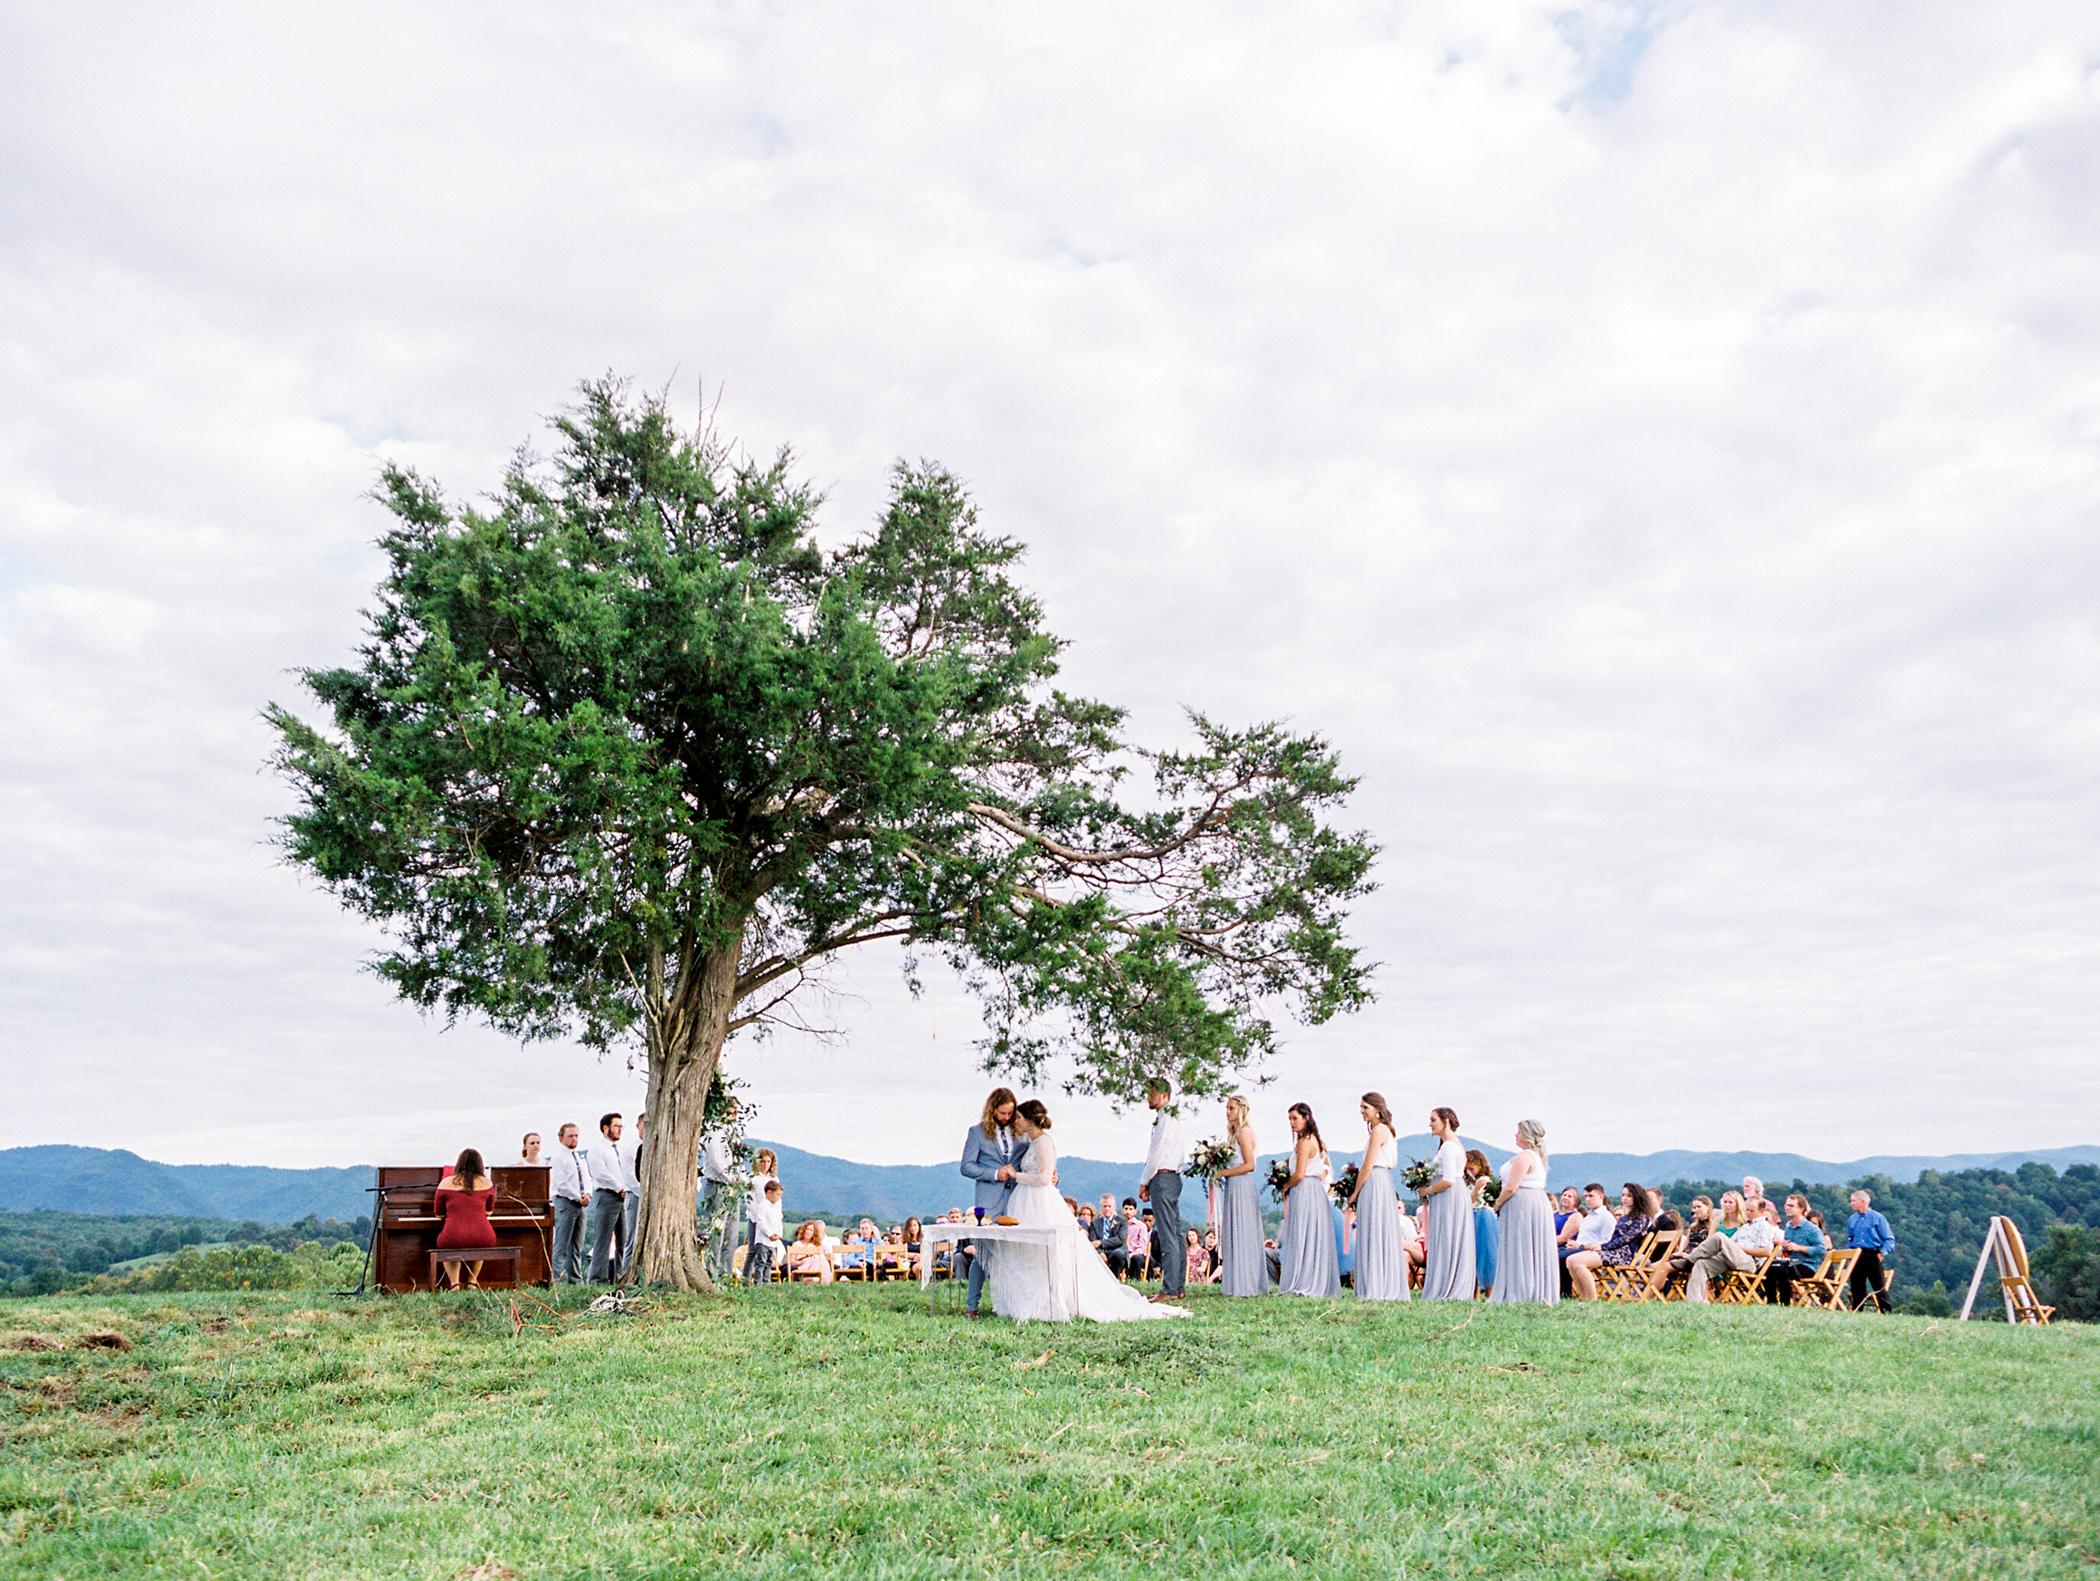 Charlotte-Film-Wedding_Photographer-heartstone-lodge-virginia-22.jpg